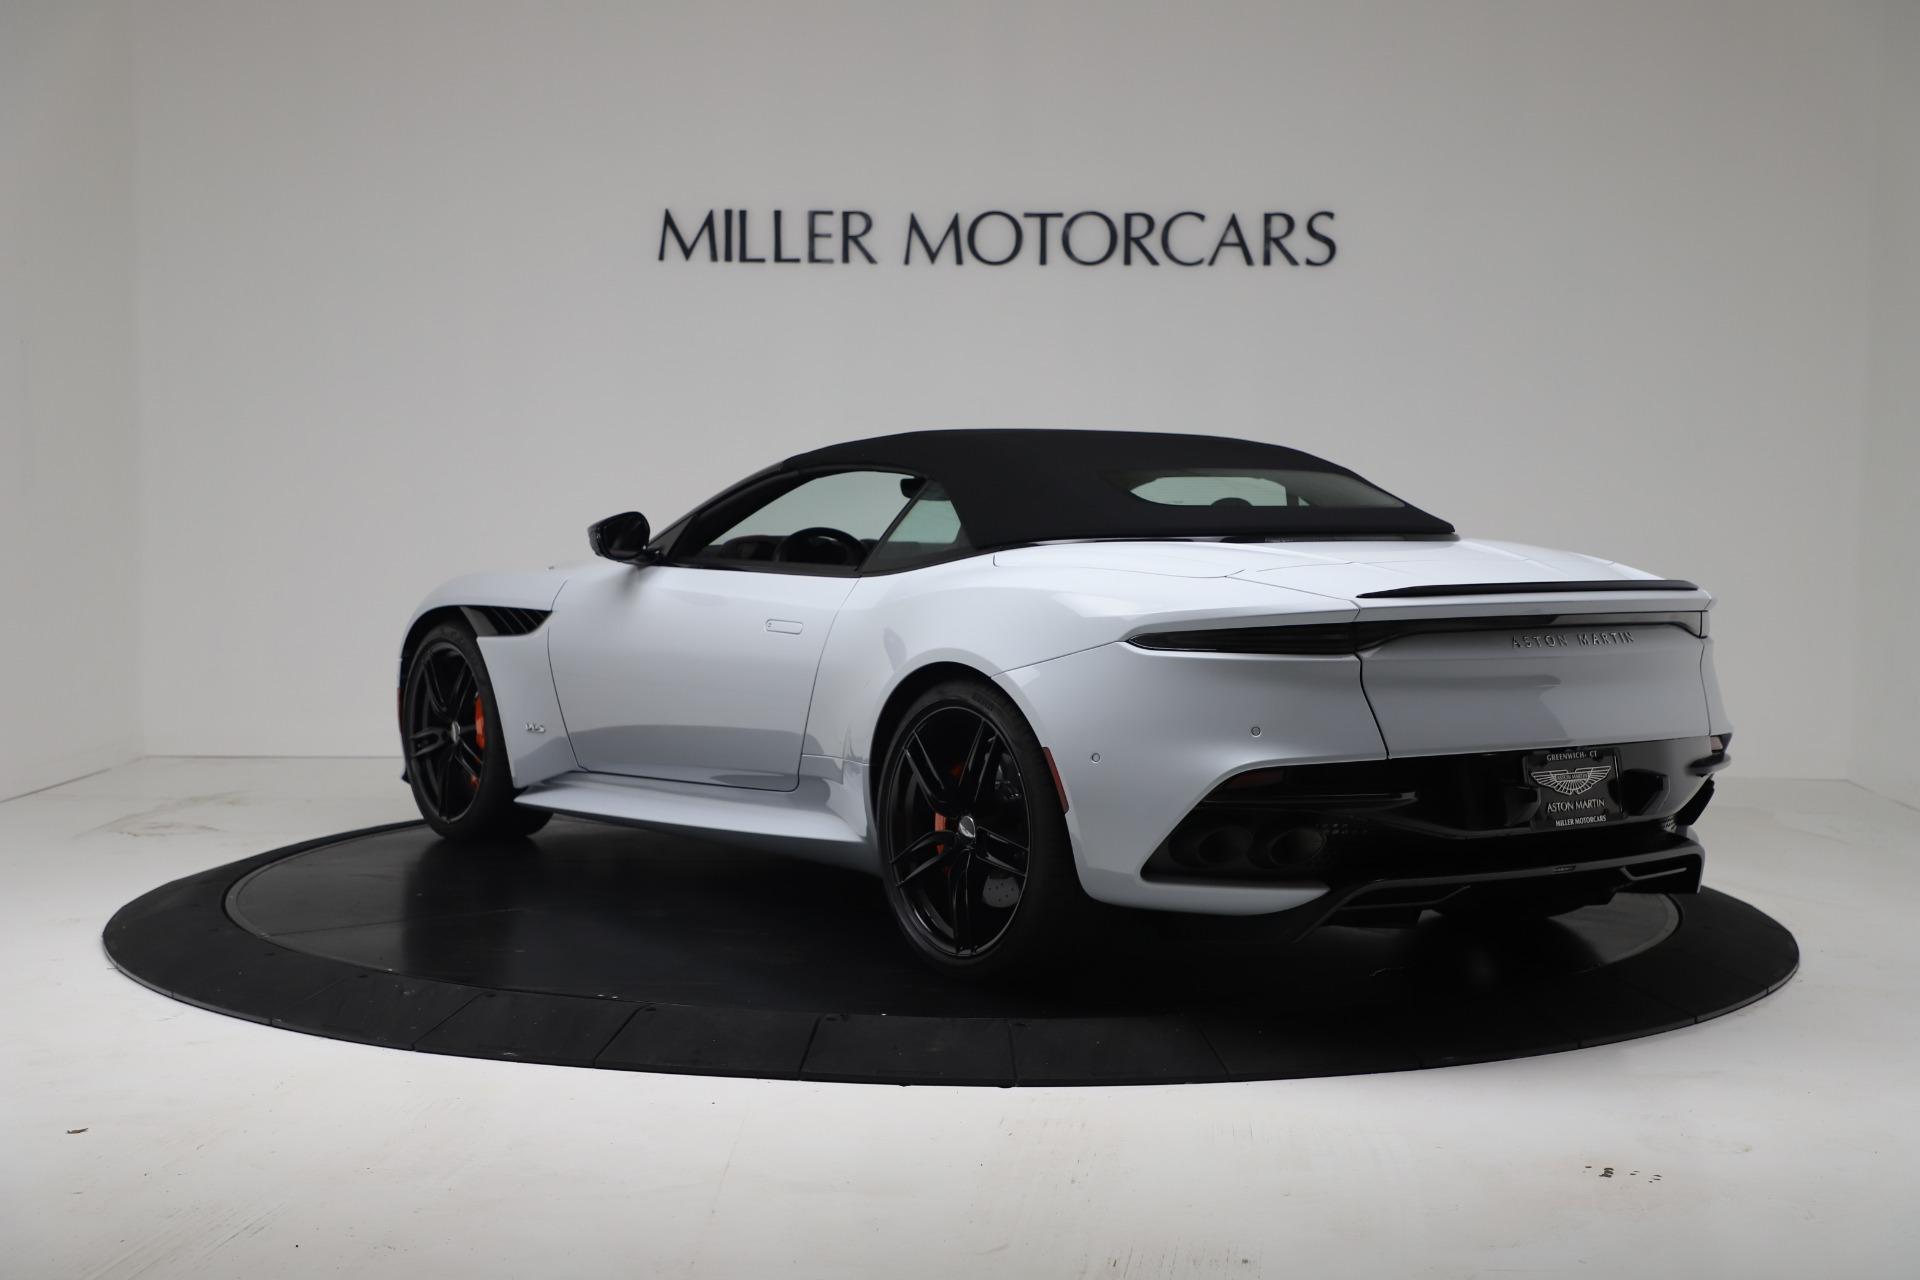 New 2020 Aston Martin DBS Superleggera Volante Convertible For Sale In Westport, CT 3484_p15